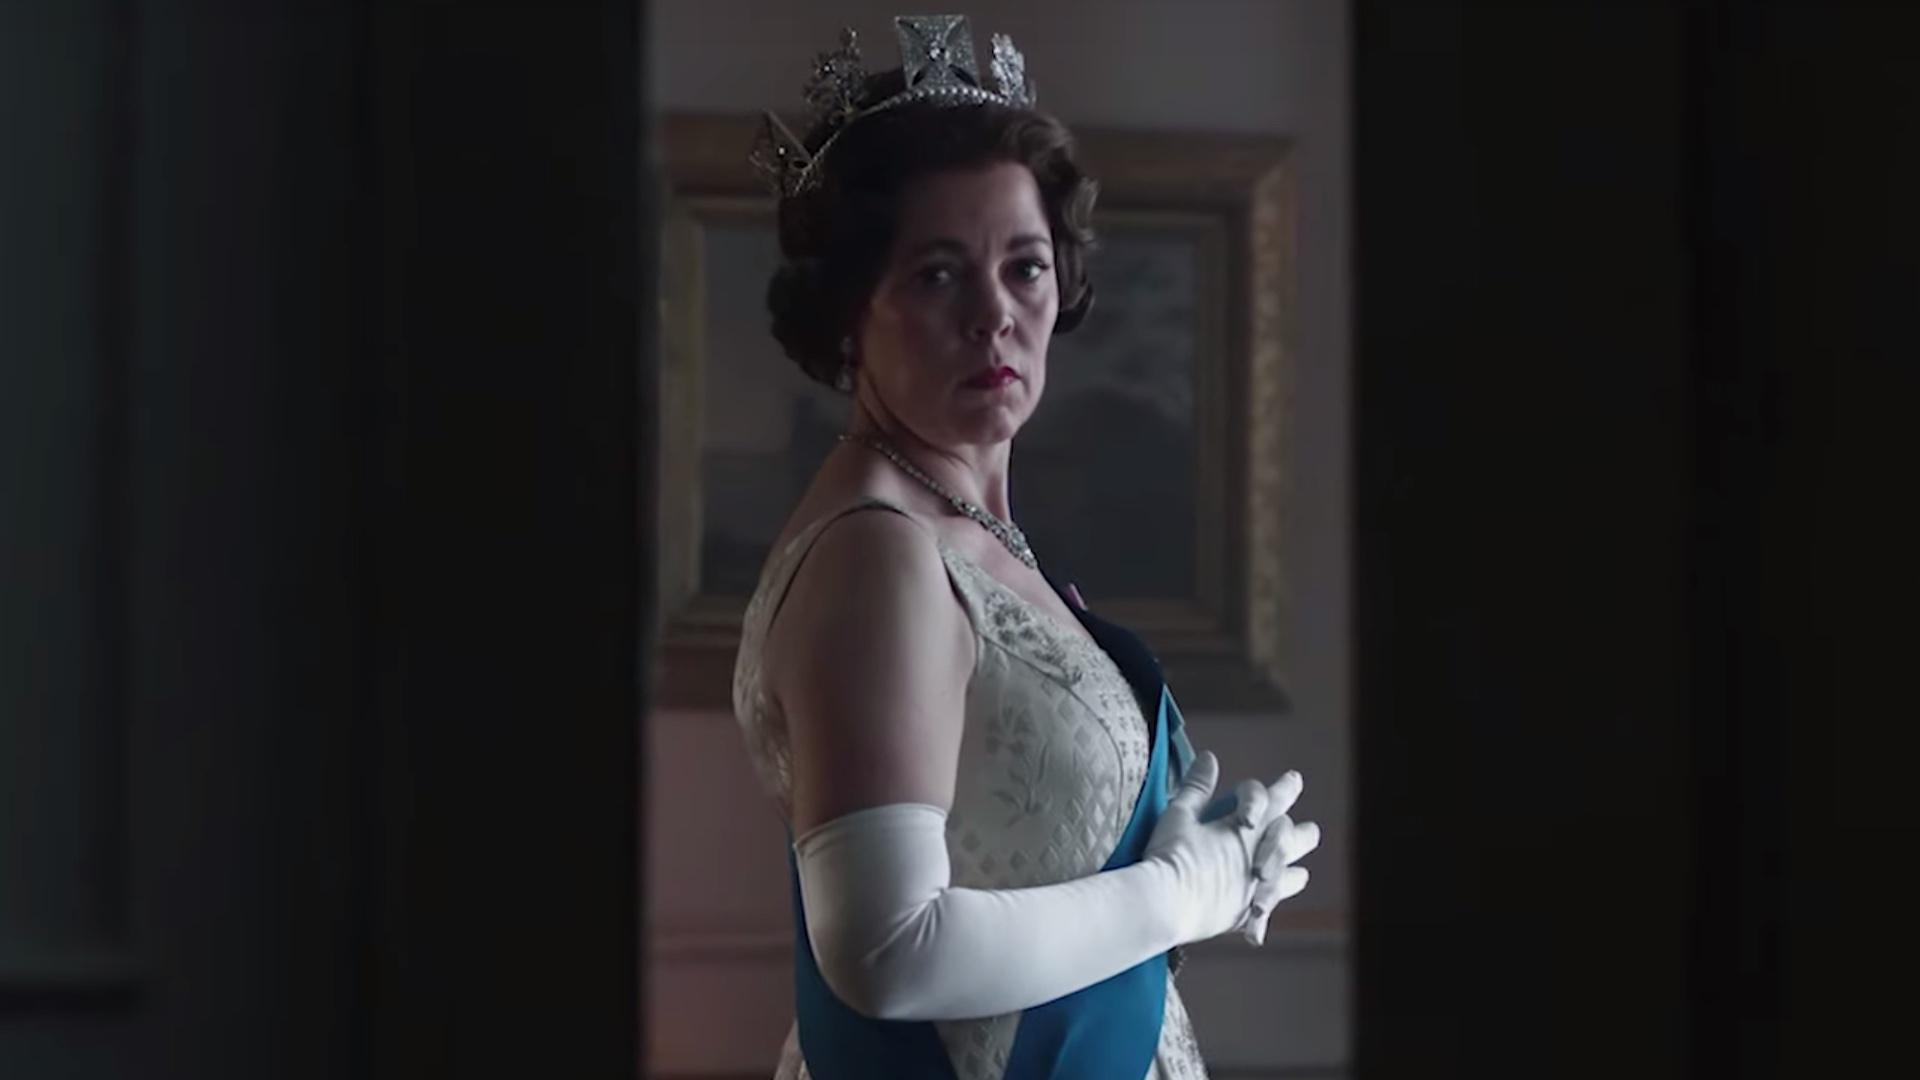 teaser-trailer-for-netflixs-the-crown-season-3-shows-olivia-colman-as-queen-elizabeth-social.jpg